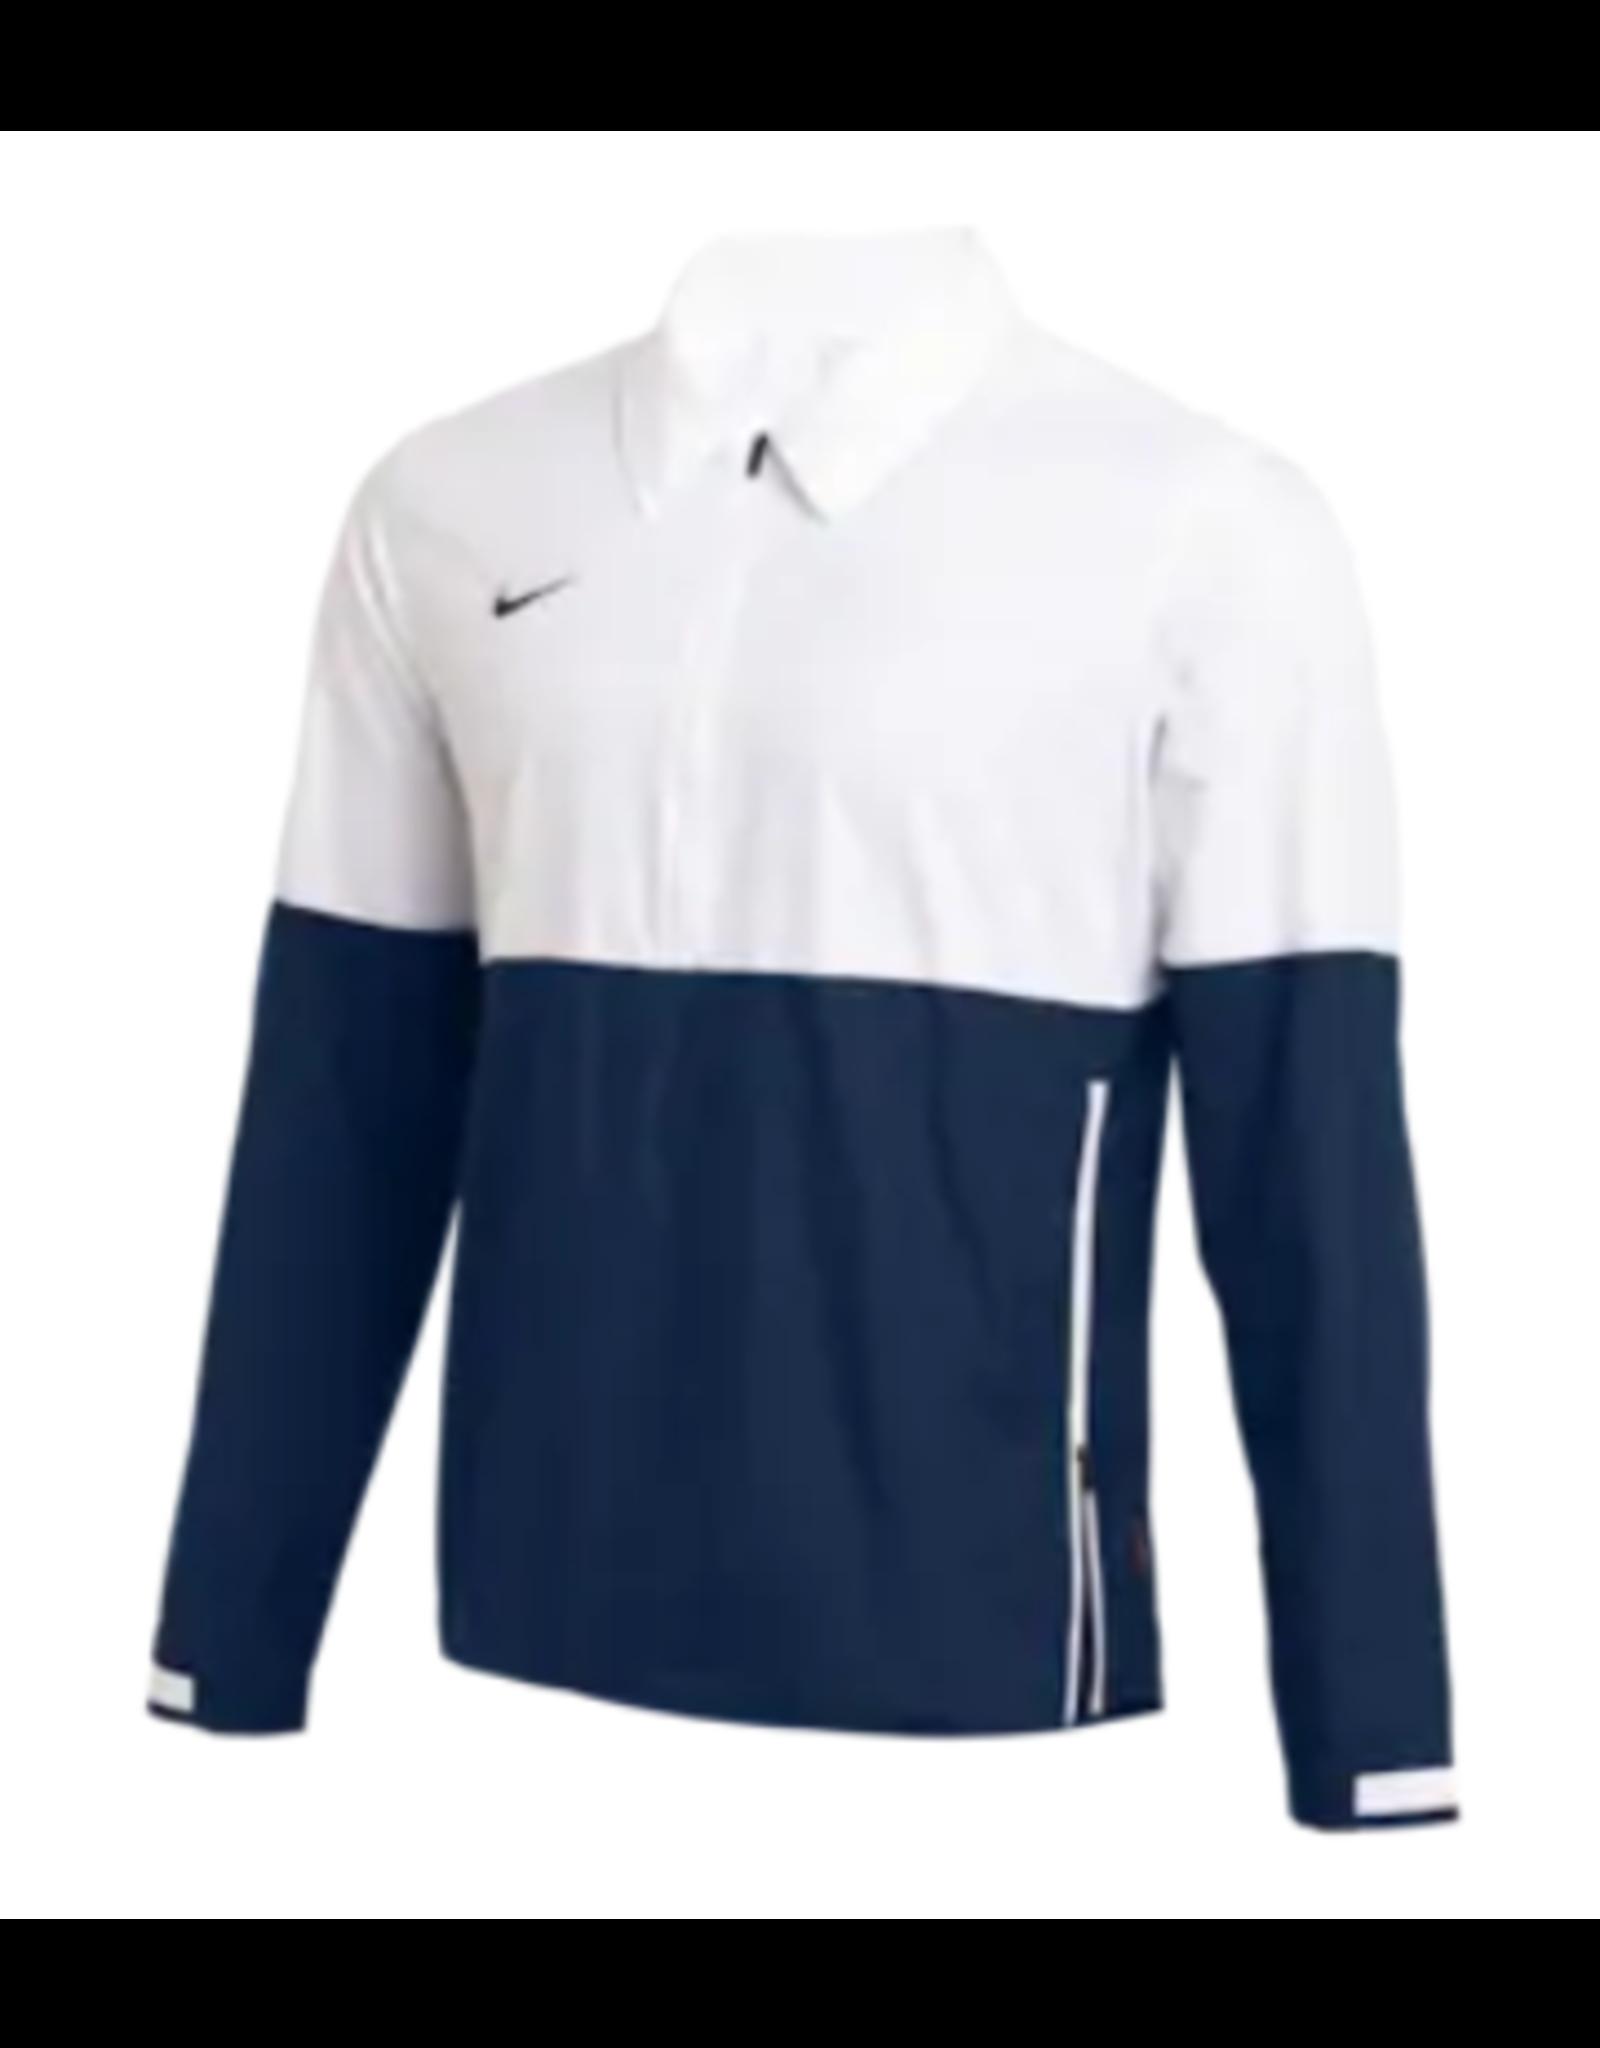 NON-UNIFORM JACKET - Nike Team Authentic Lightweight Coaches Jacket